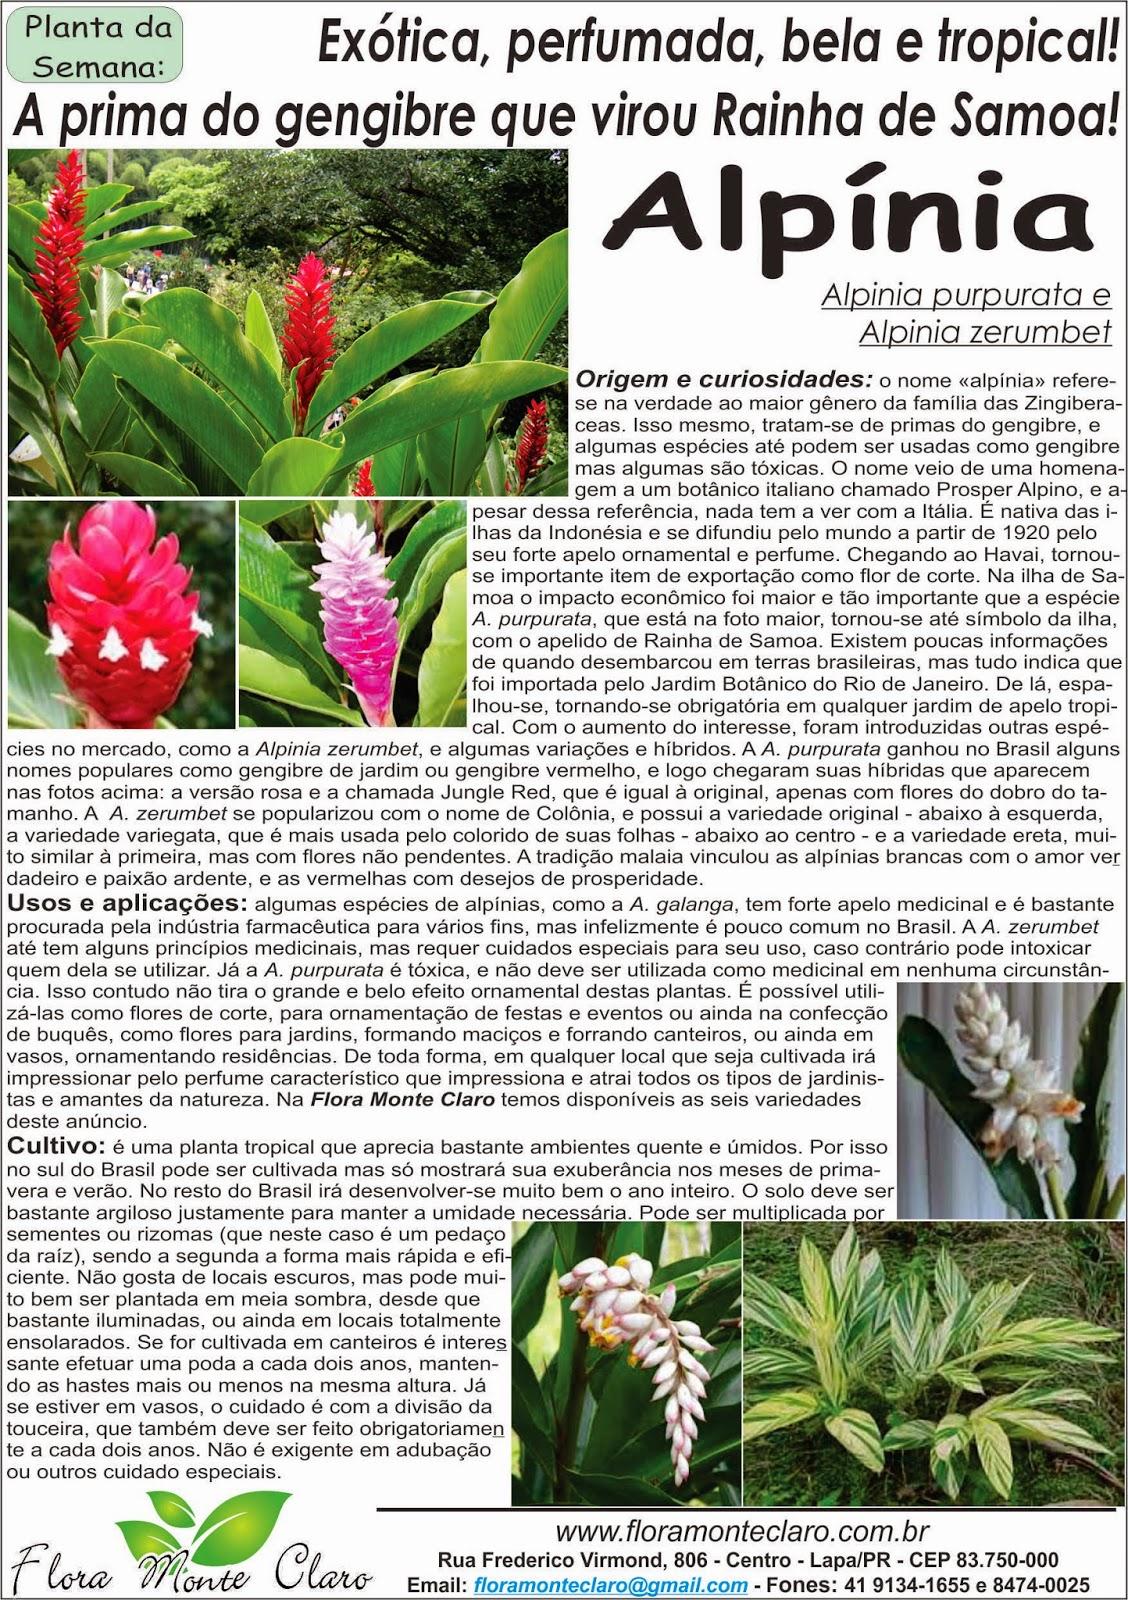 Planta da Semana - Alpínia